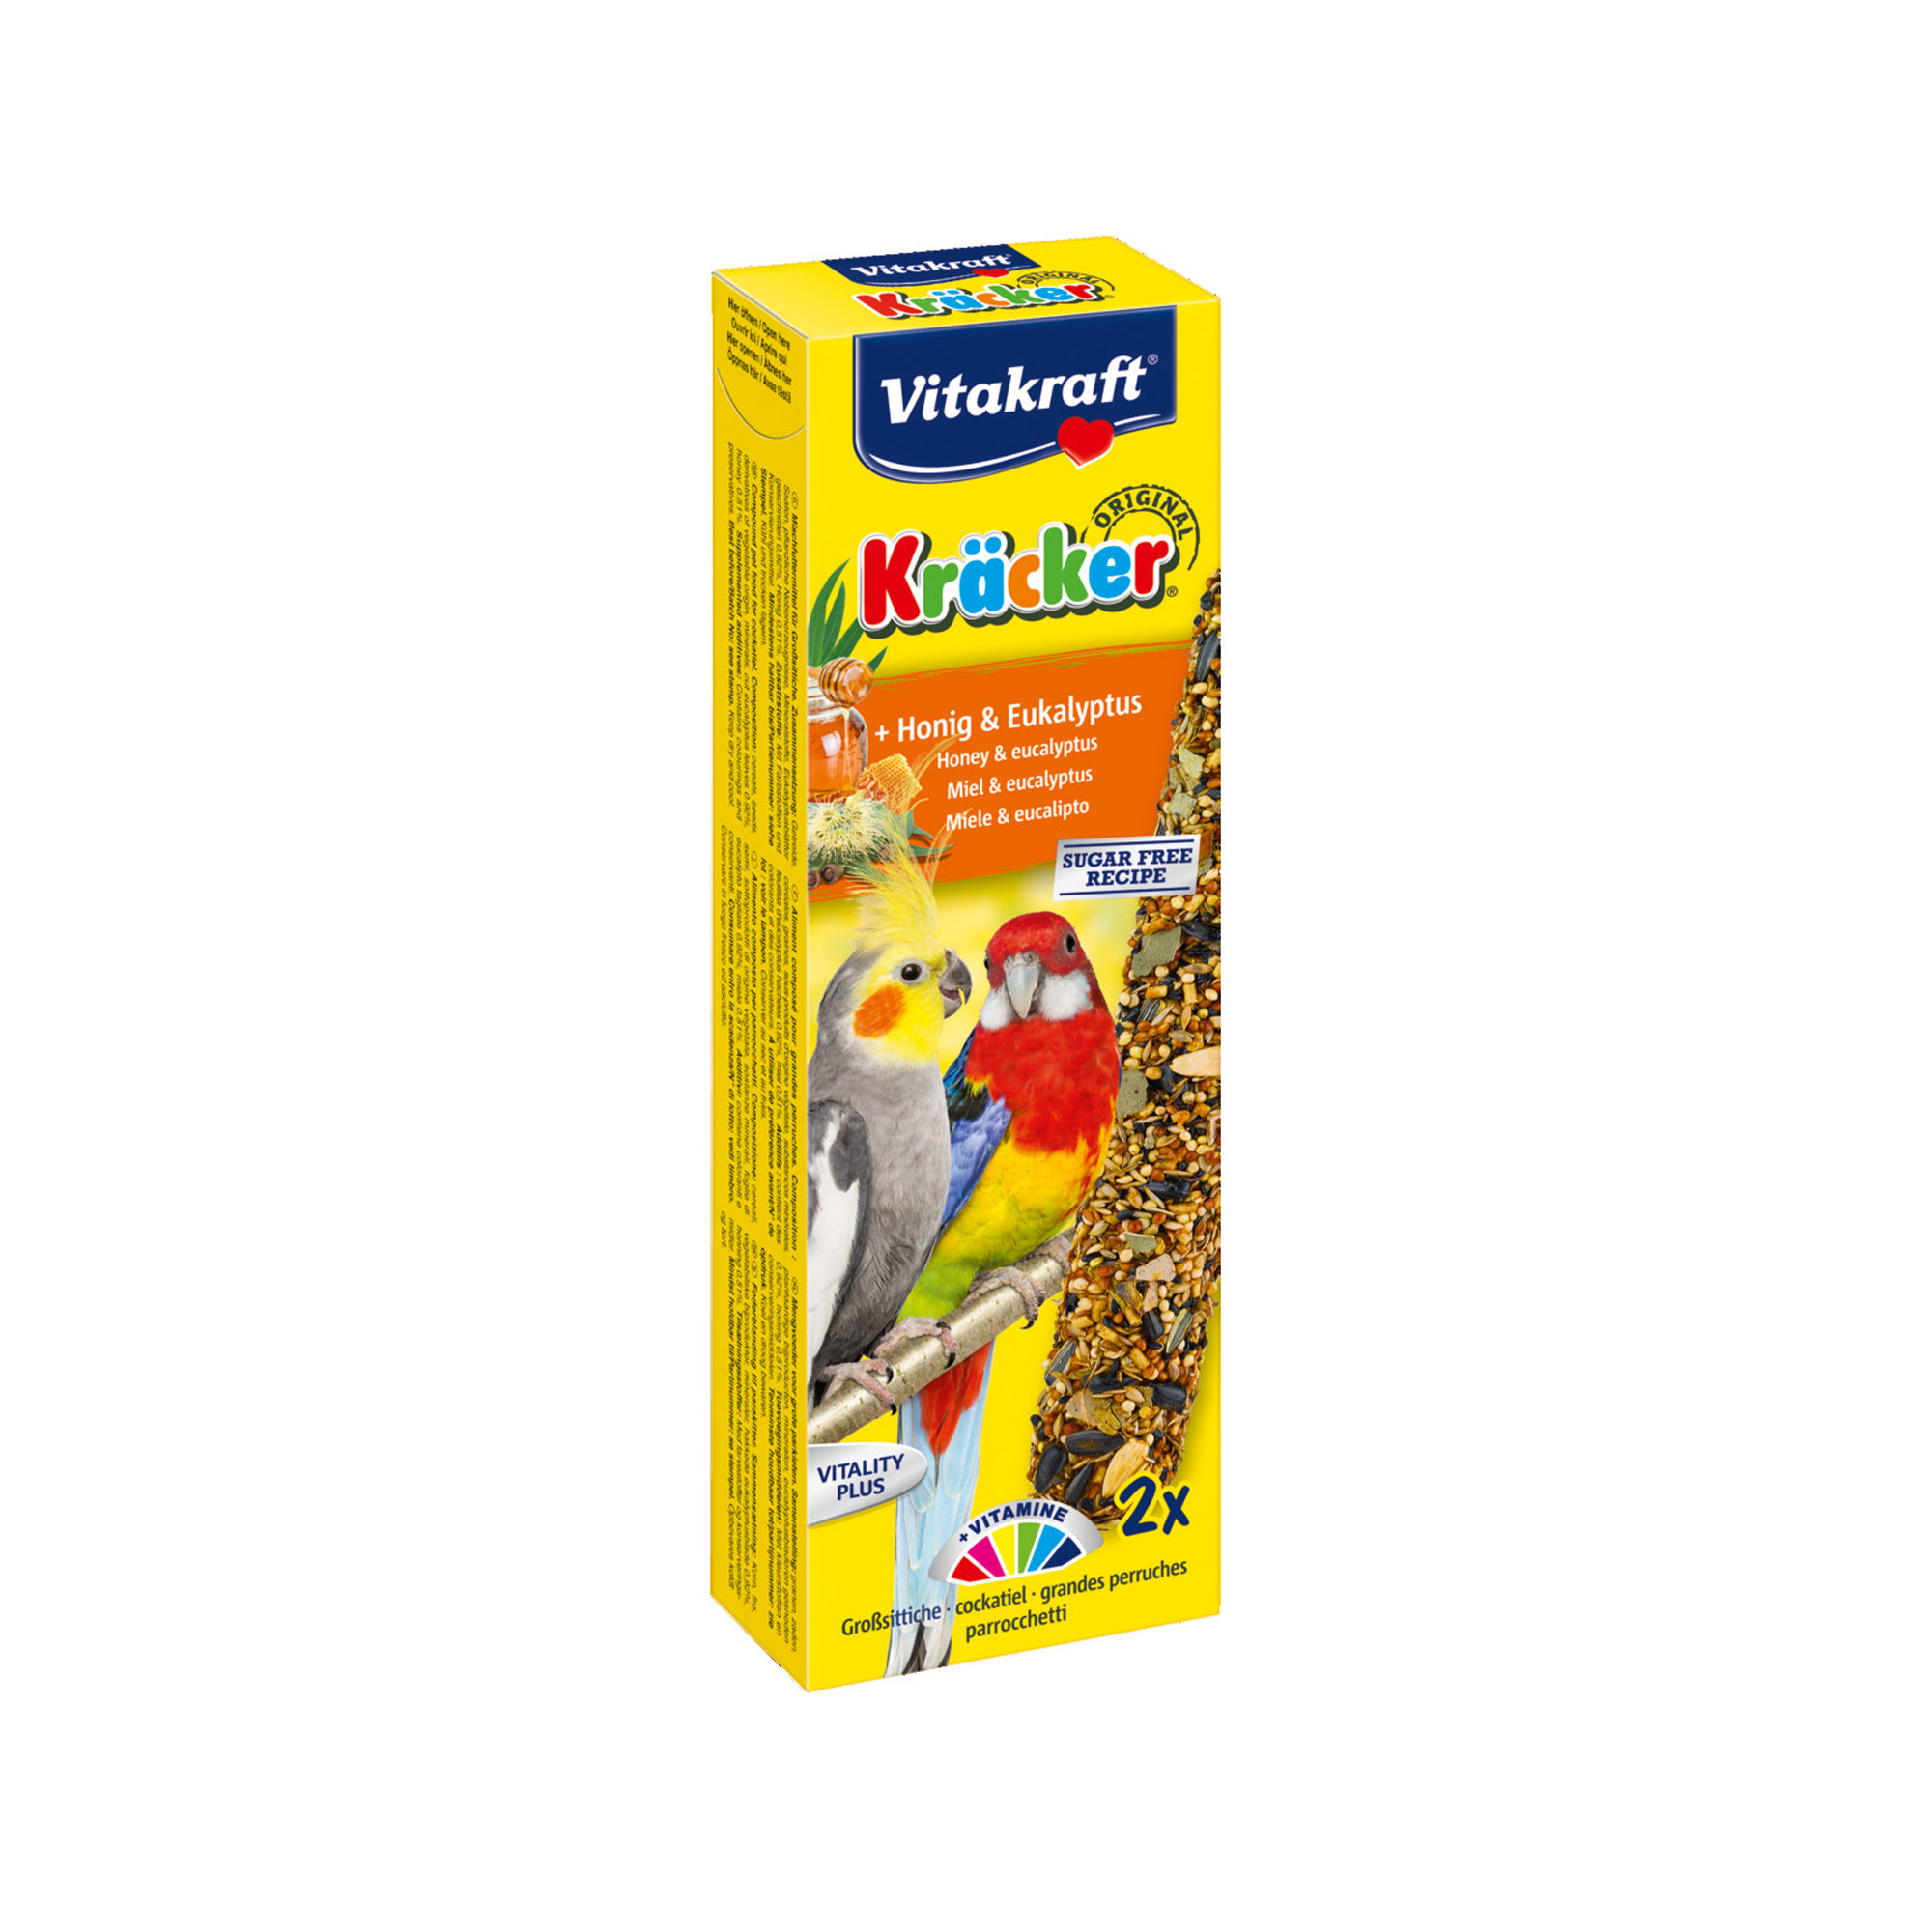 Vitakraft Kräcker - Miel et eucalyptus